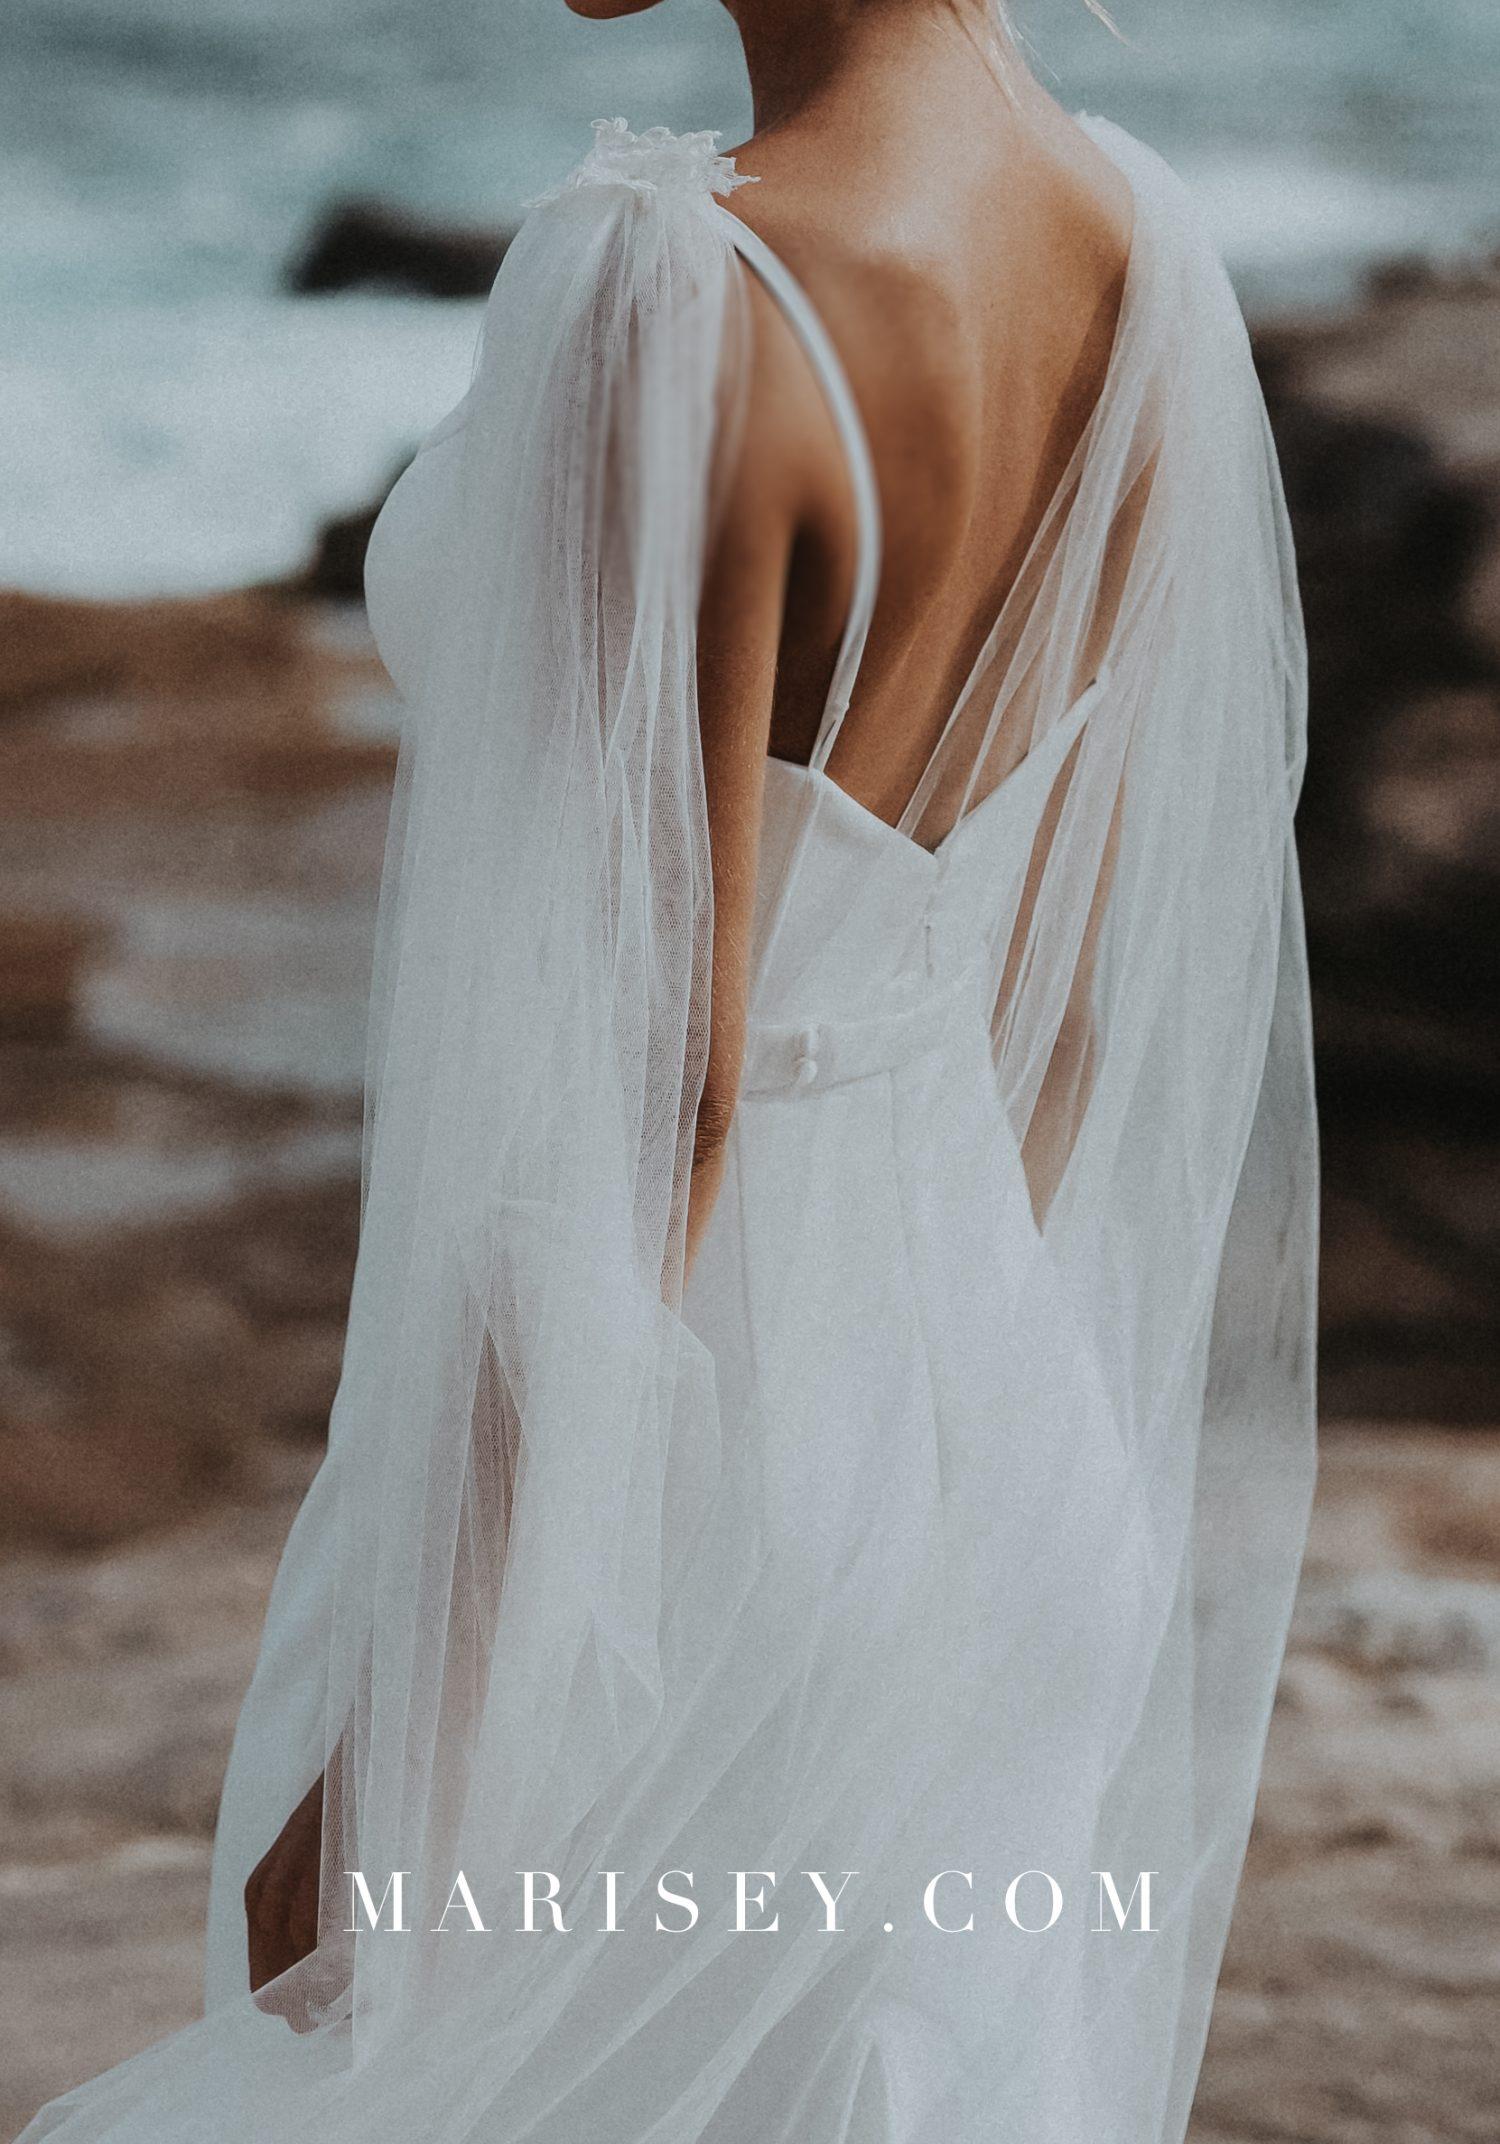 peleryny do sukni